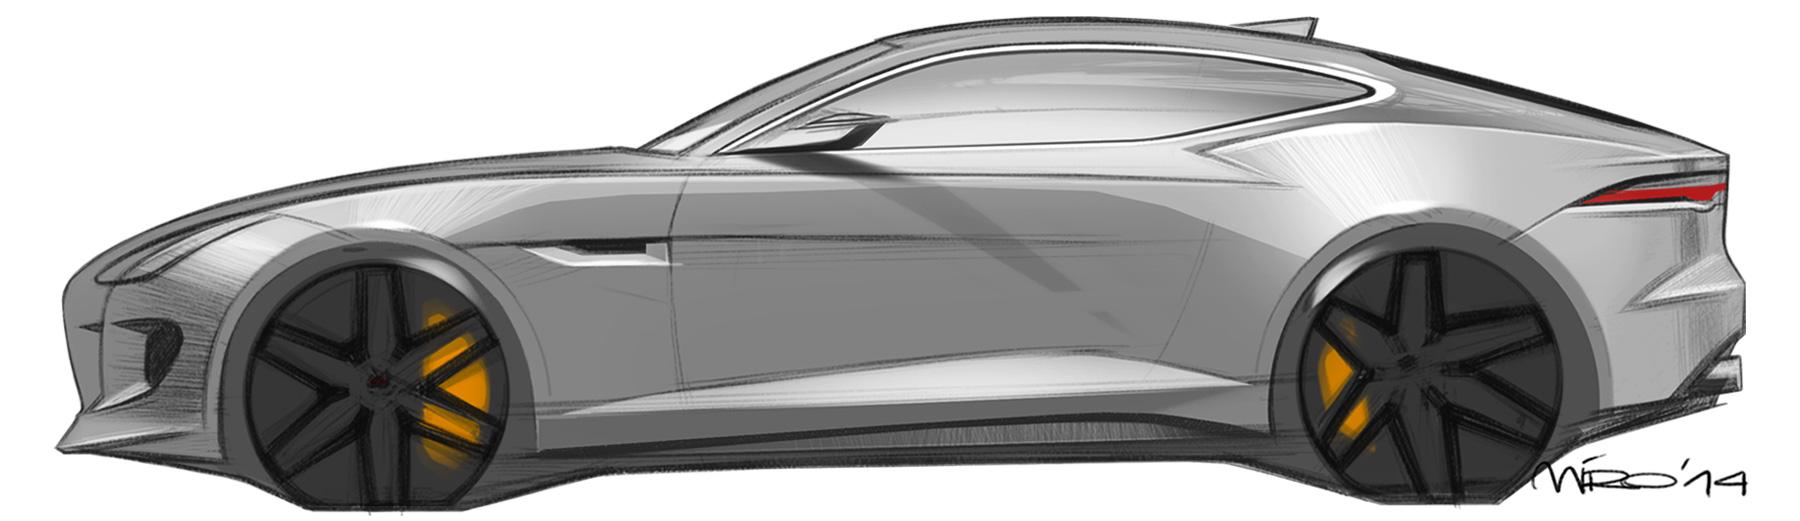 Jaguar F-Type Sketch by Miroslav Dimitrov